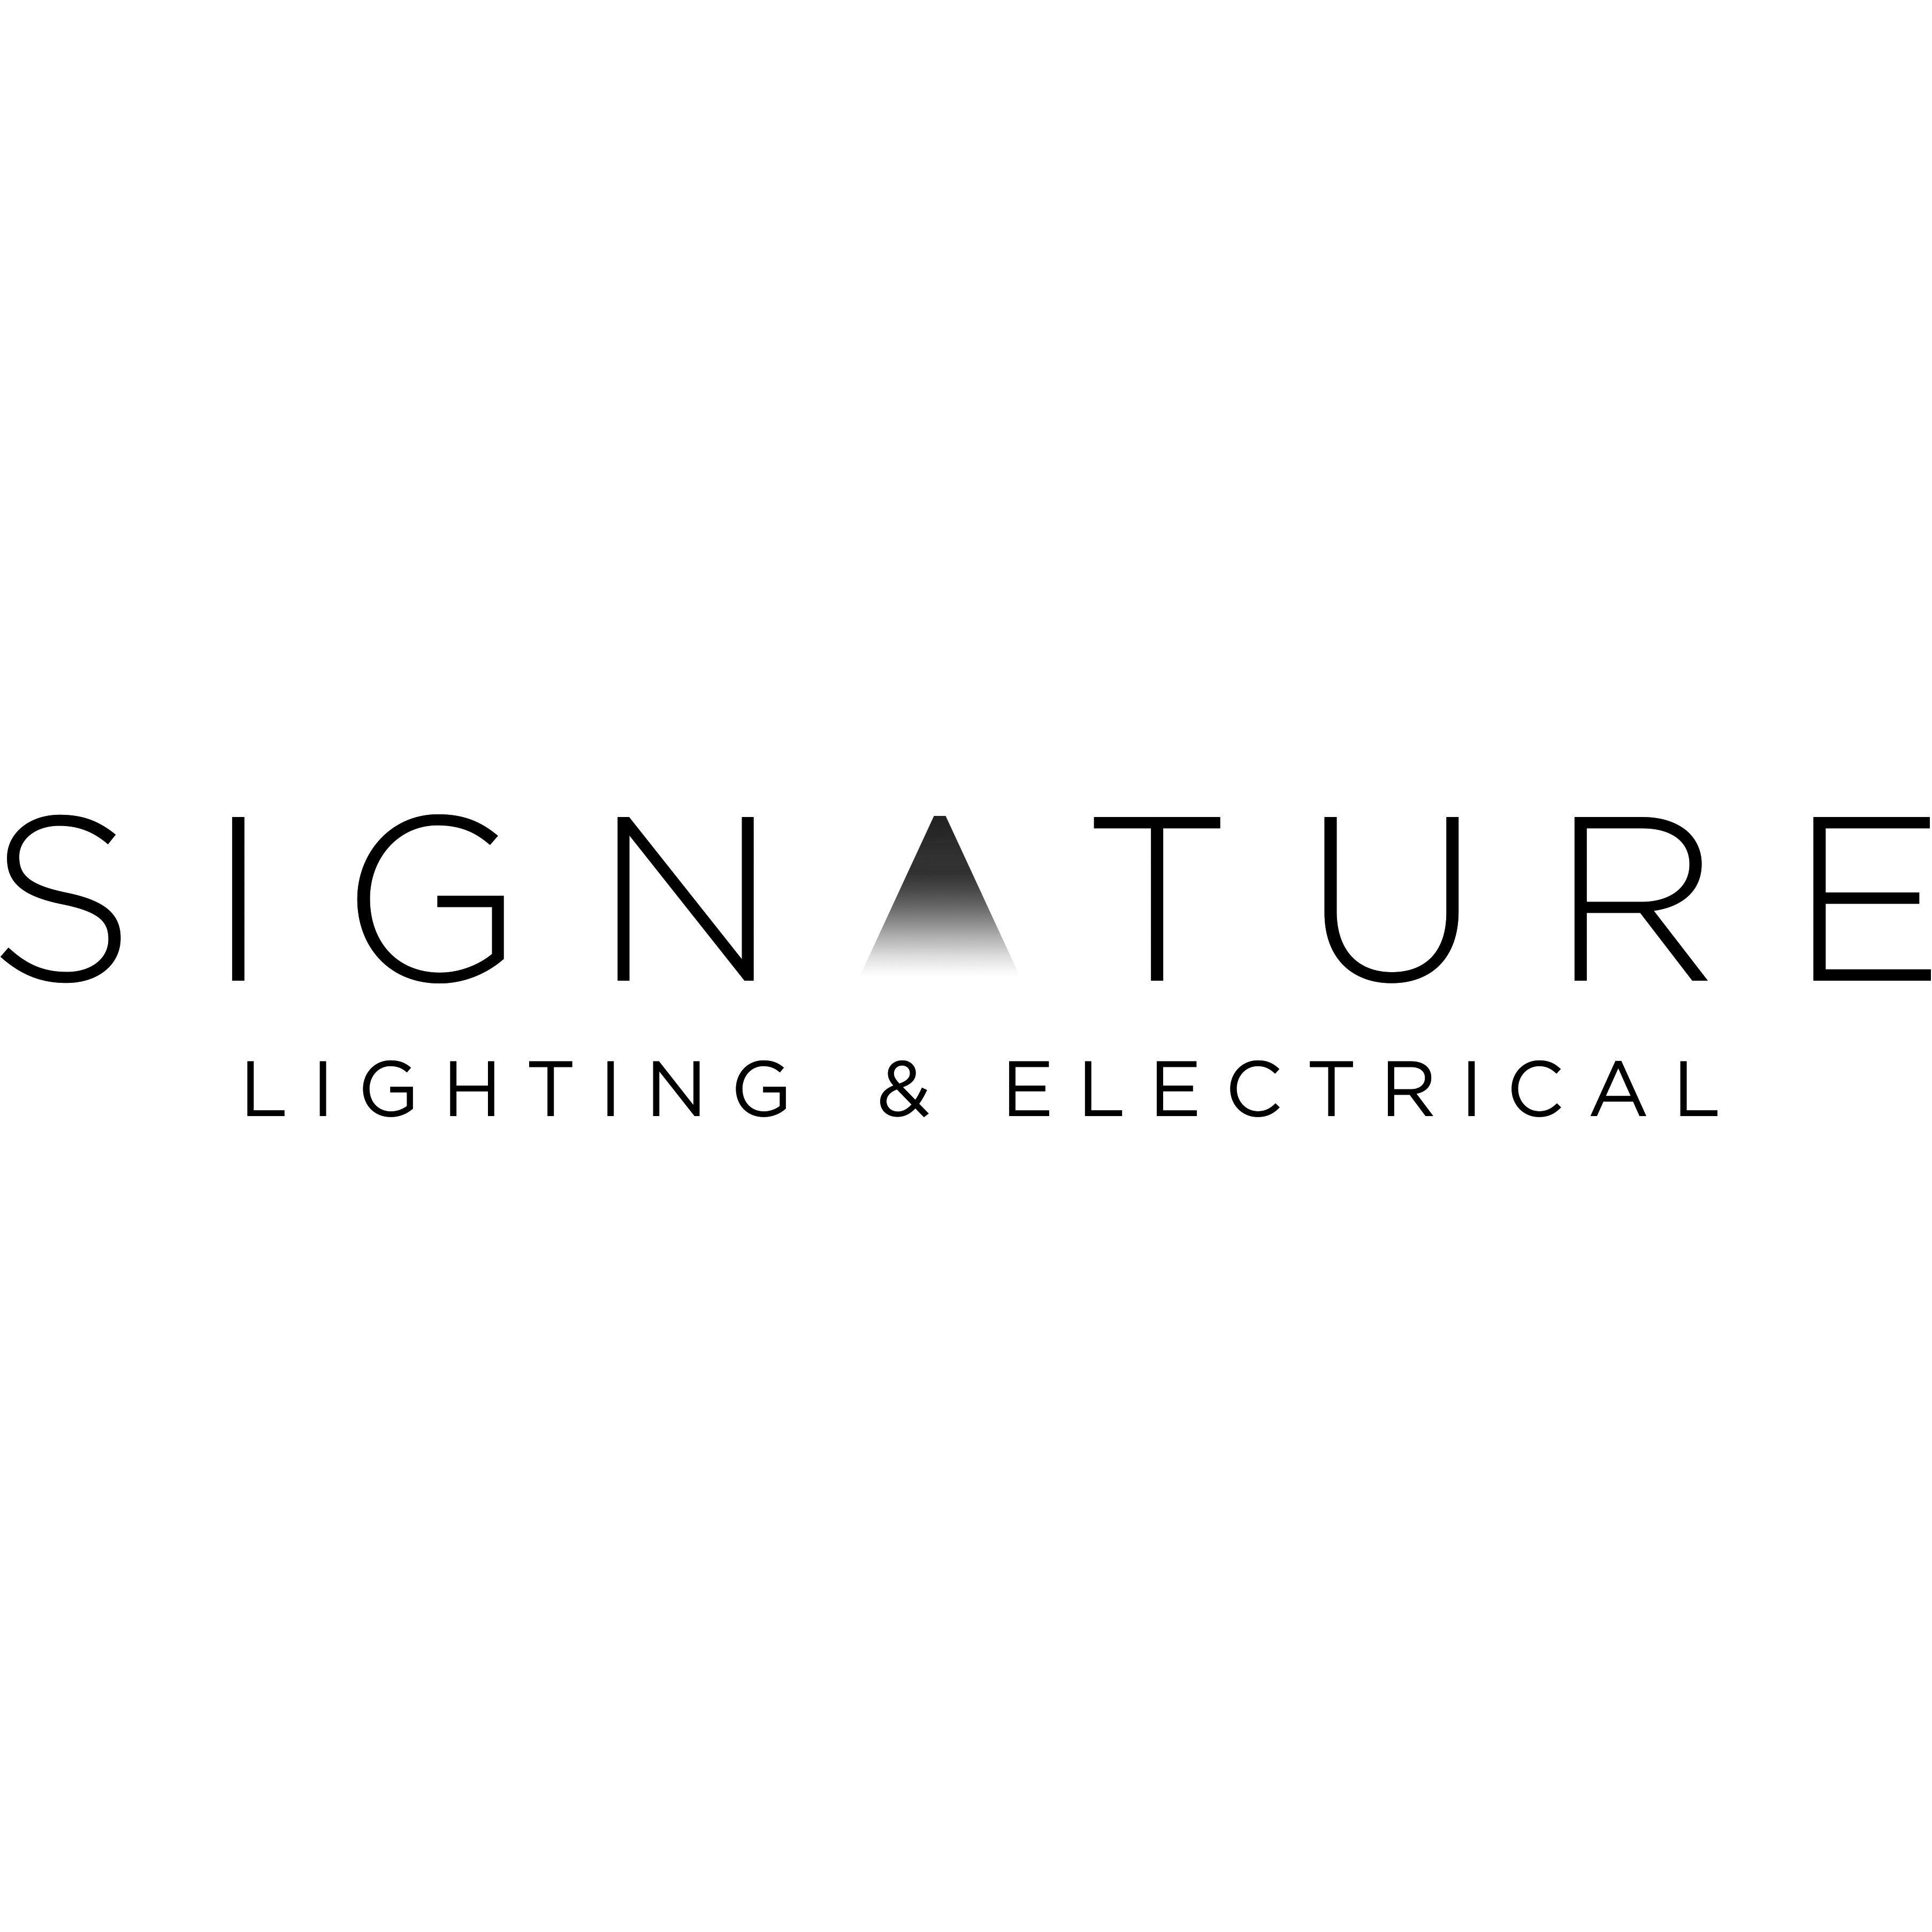 Signature Lighting Specialists